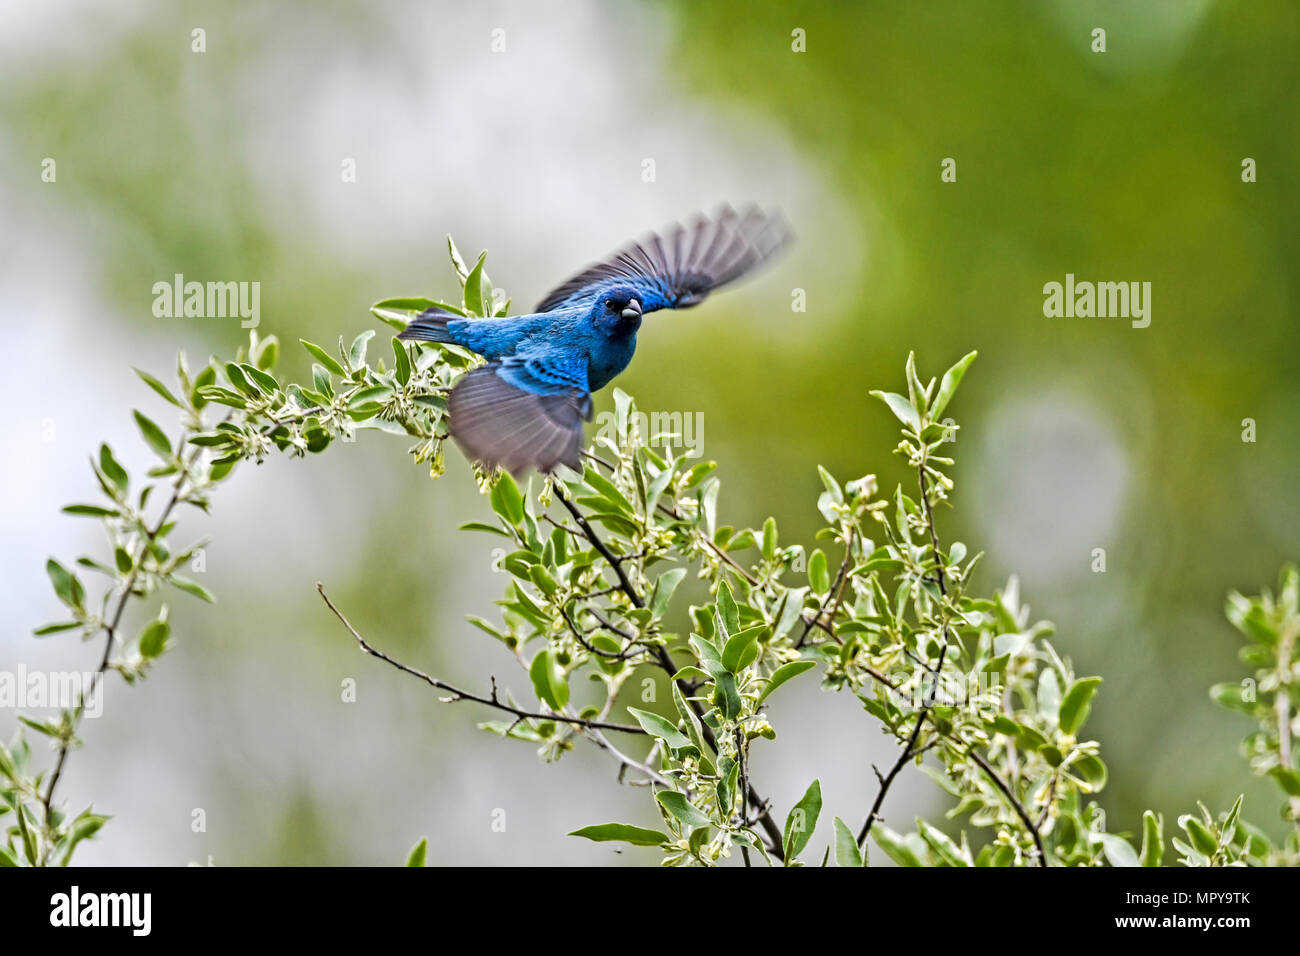 Blue bird flying over plants - Stock Image